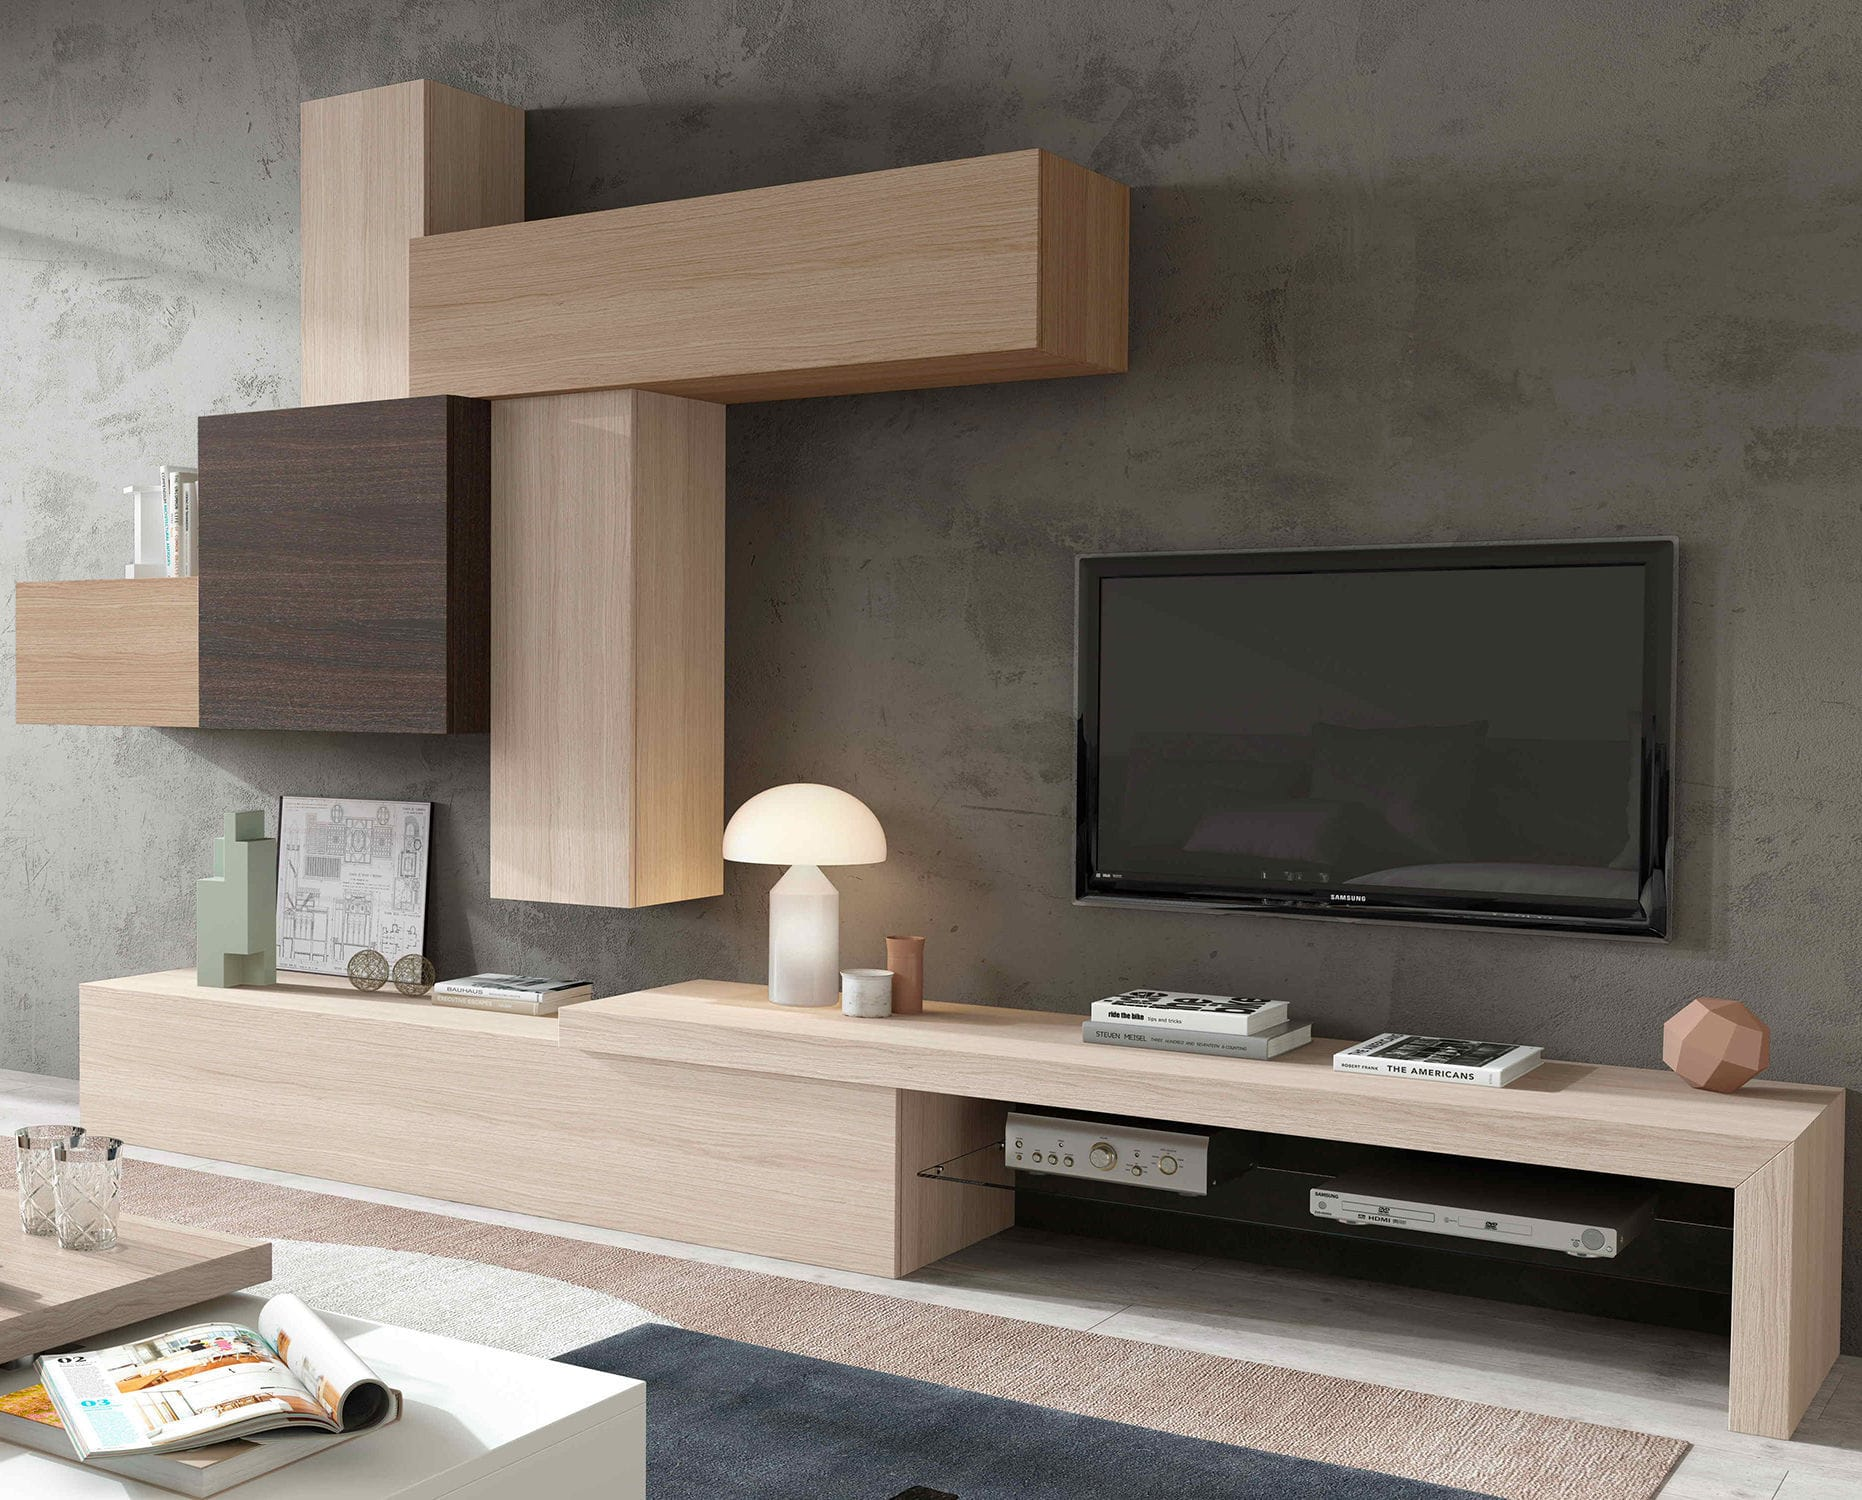 Contemporary Tv Wall Unit Wooden Hi Fi Impersonal2k15 3  # Muebles Piferrer Iline